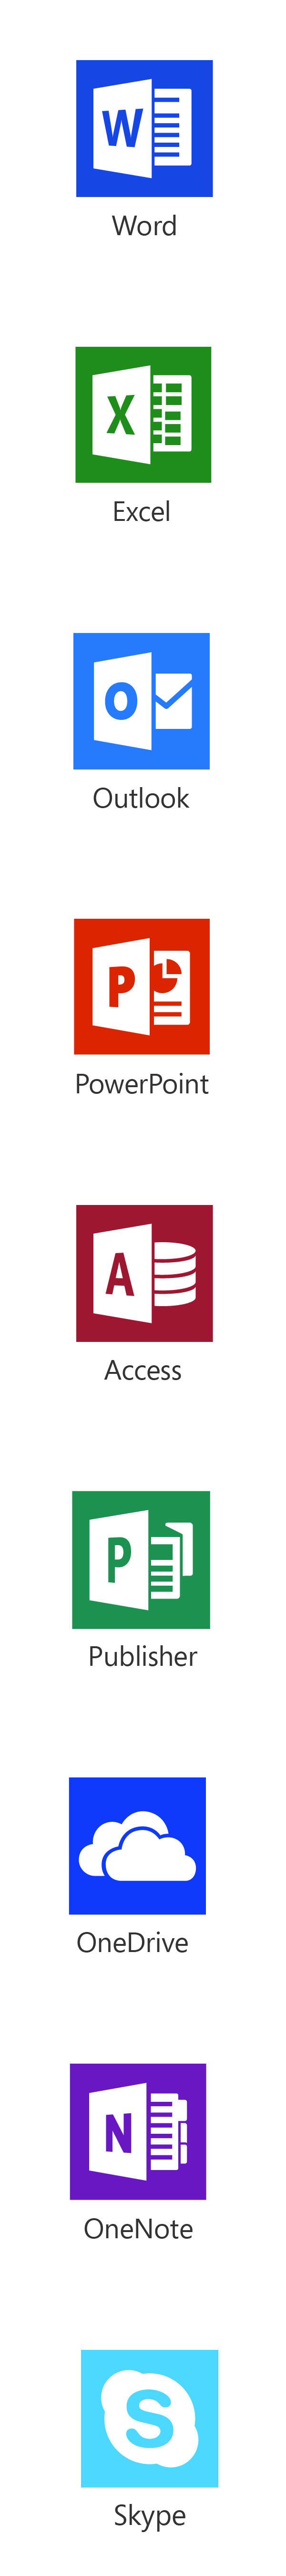 Office programma's inbegrepen bij Office 365: Word, Excel, Outlook, Powerpoint, Access, Publisher, OneDrive, OneNote, Skype